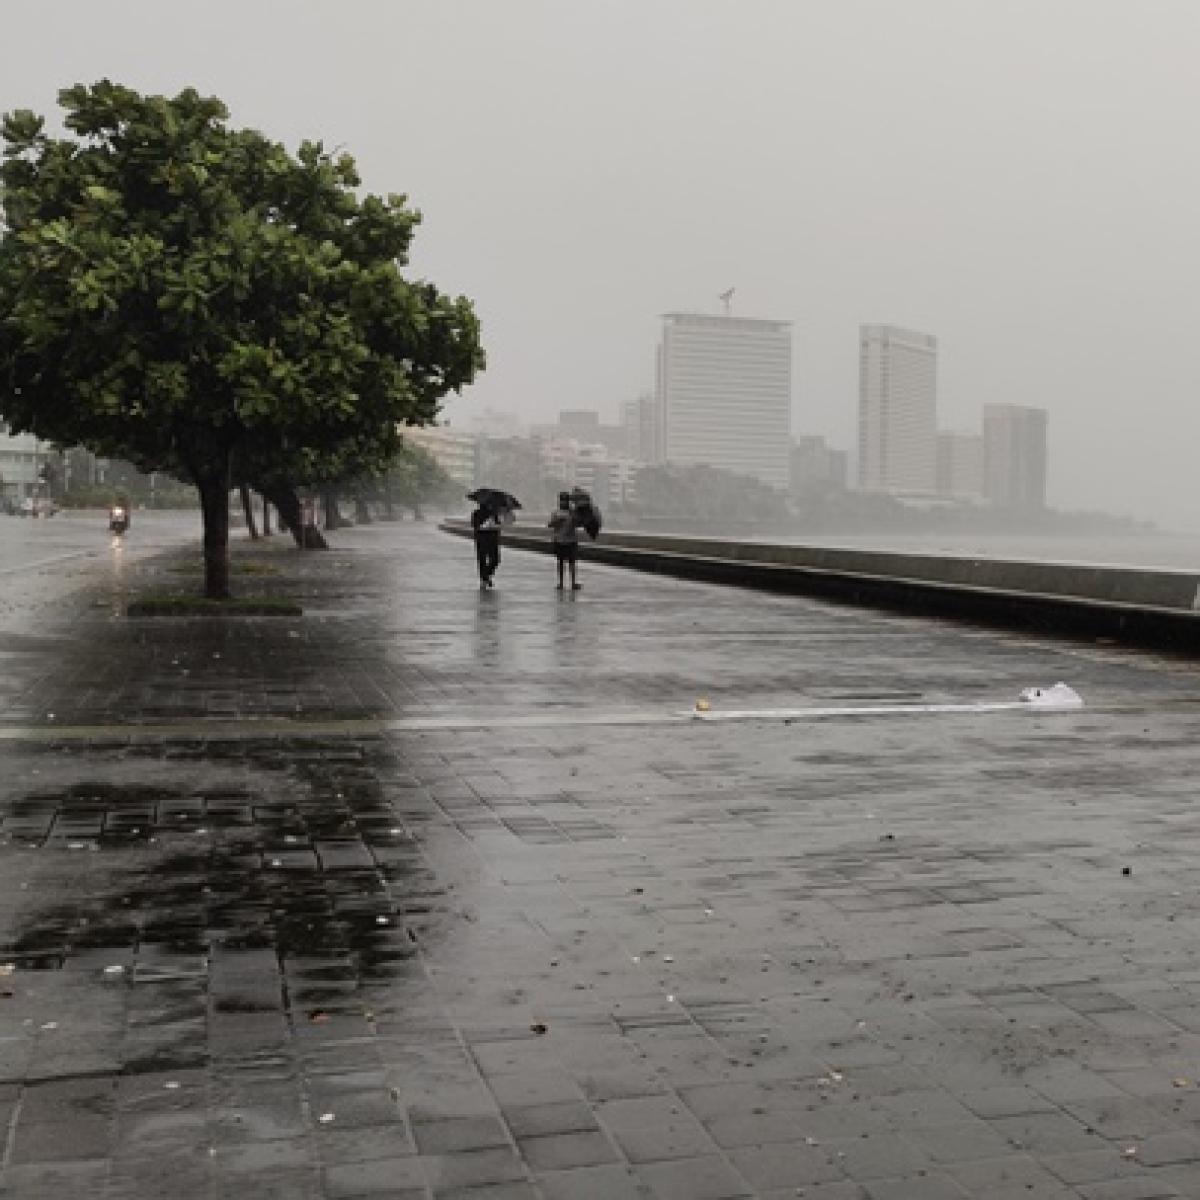 Mumbai Weather Updates: IMD issues heavy rain warning for Tuesday in Mumbai and Thane